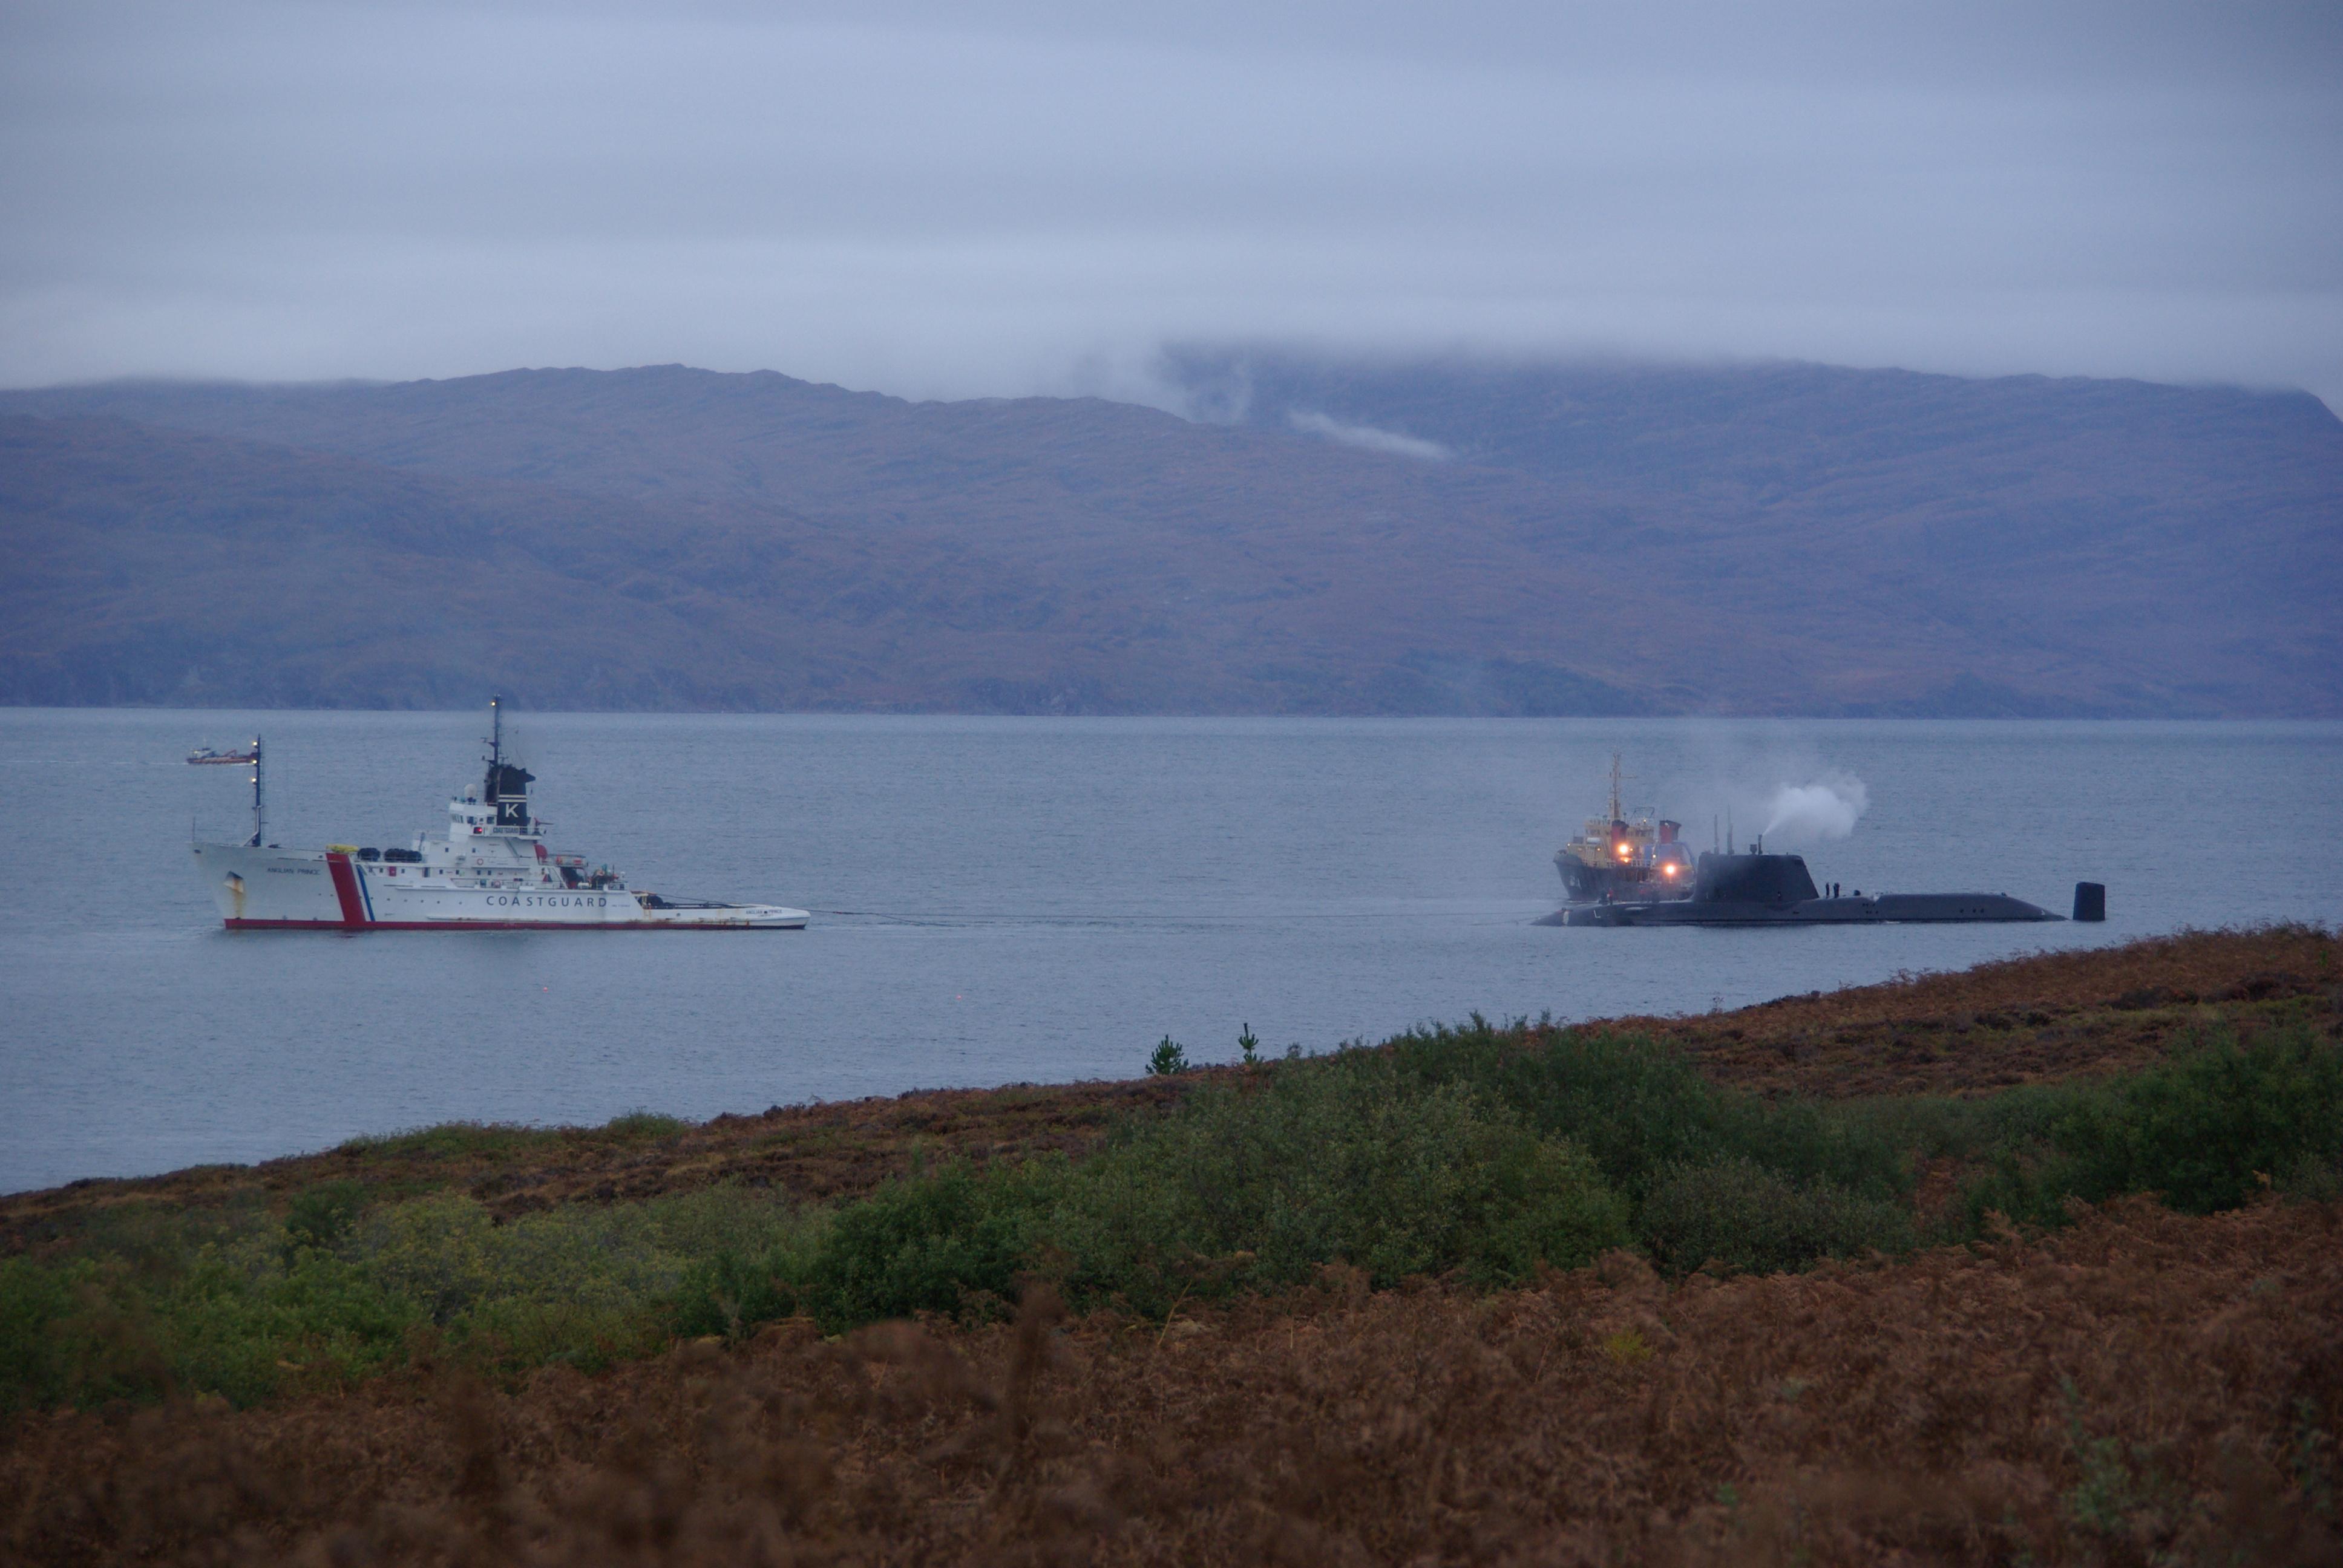 HMS_Astute_Anglian_Prince_Skye.JPG